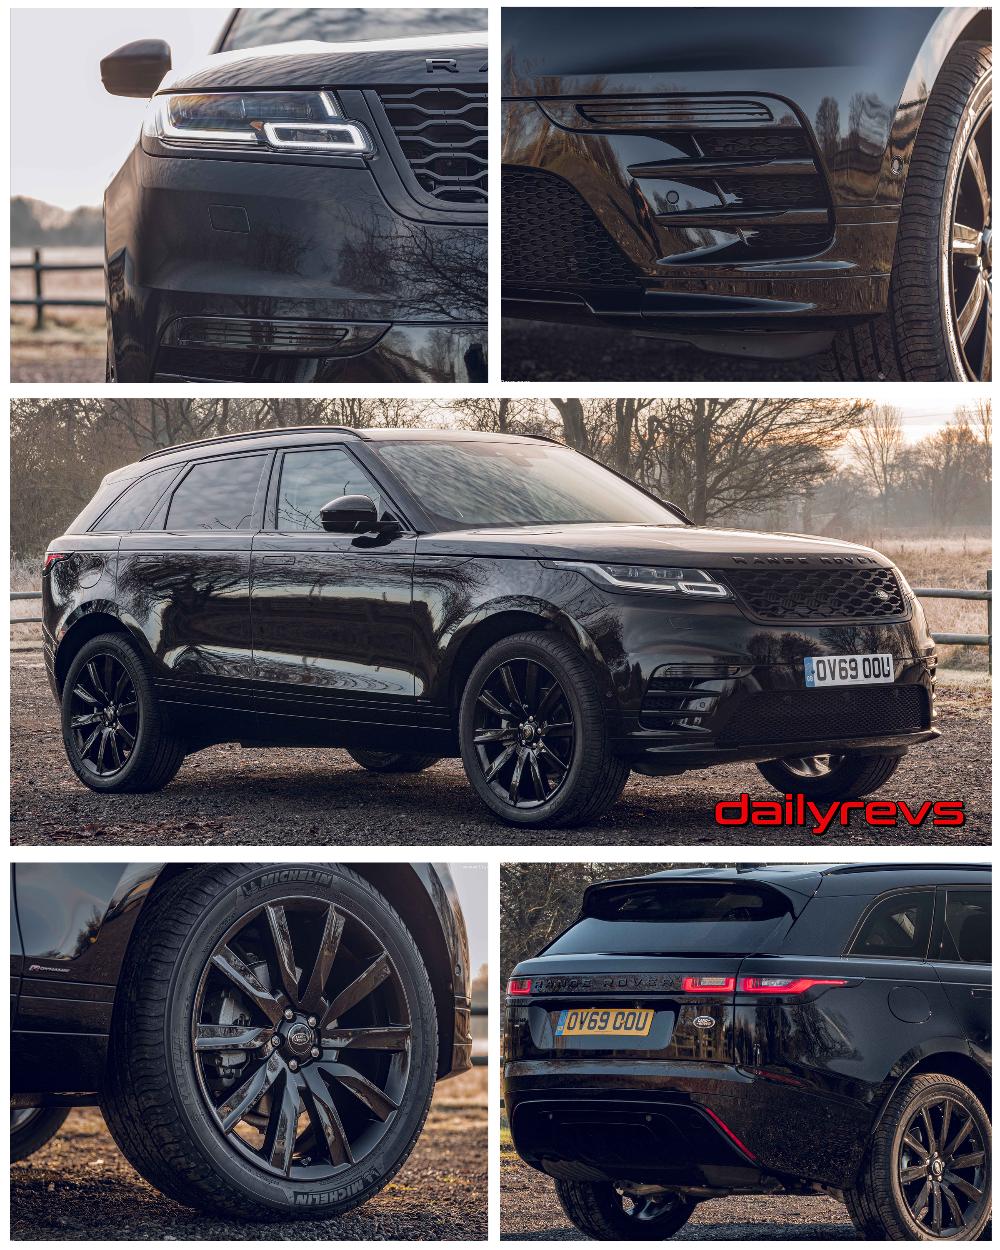 2020 Land Rover Range Rover Velar RDynamic Black HD